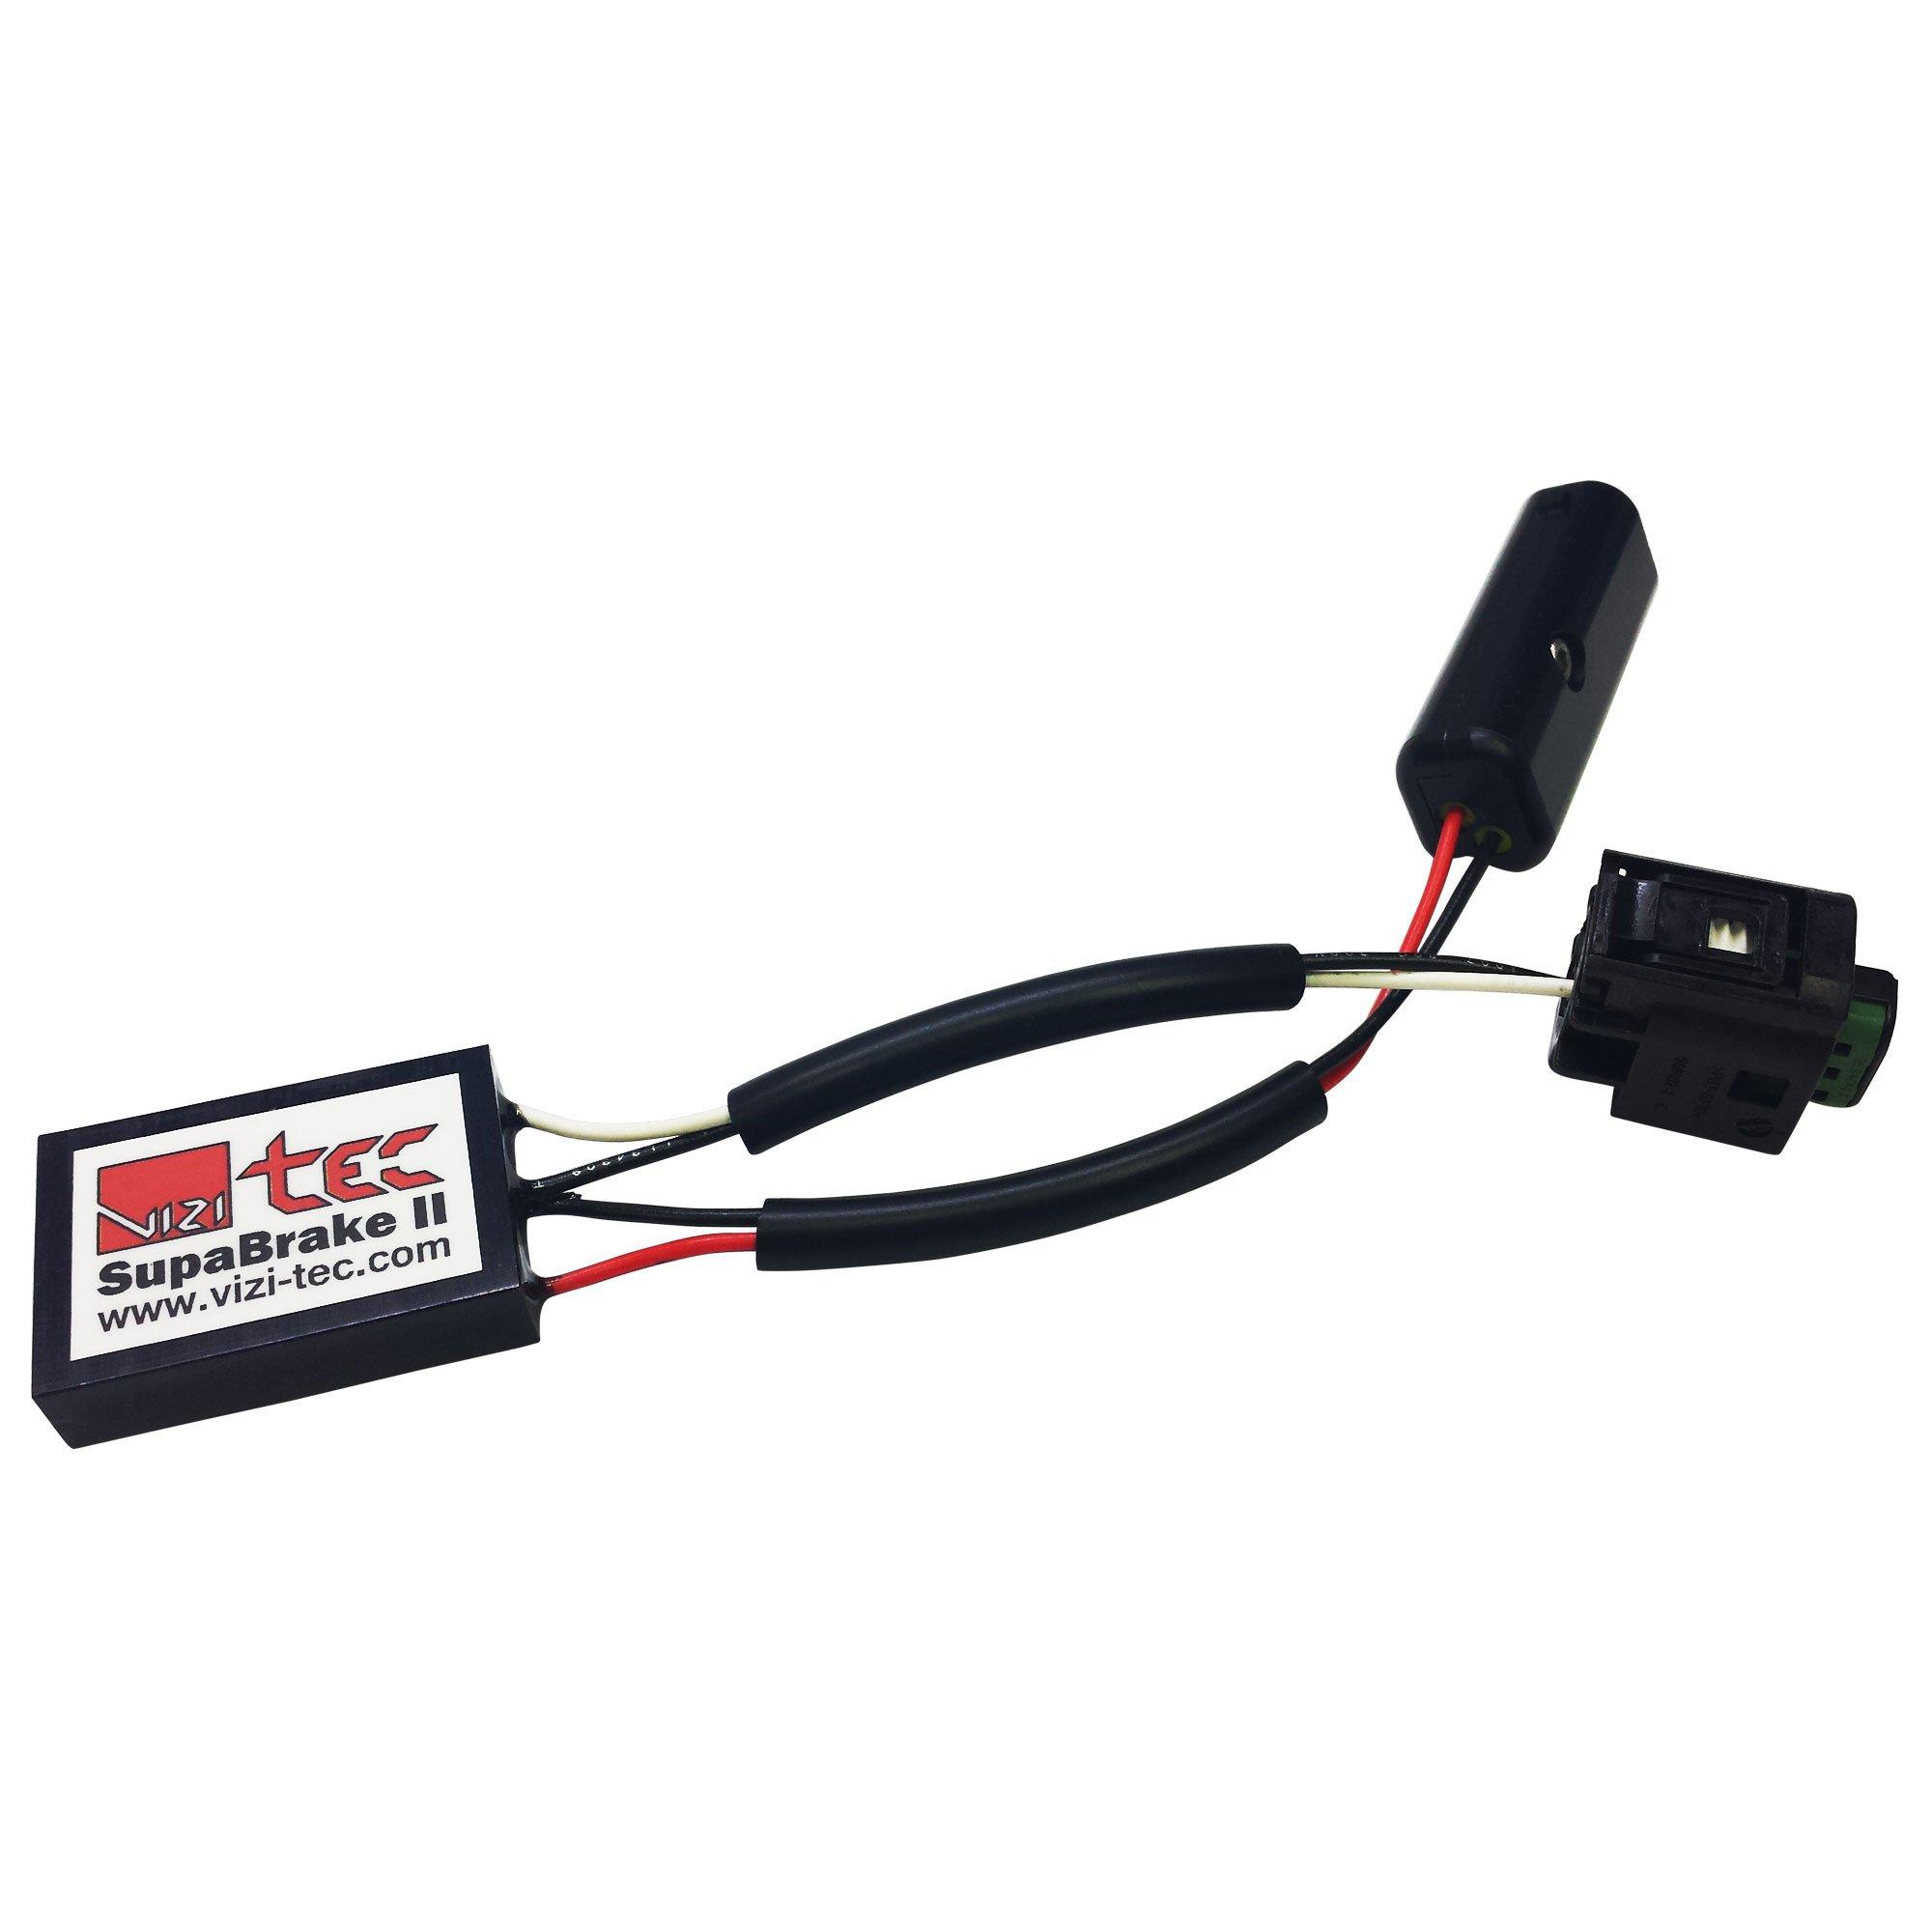 Vizi-tec SupaBrake-II KTM 1190 Adventure Smart Brake Light Modulator